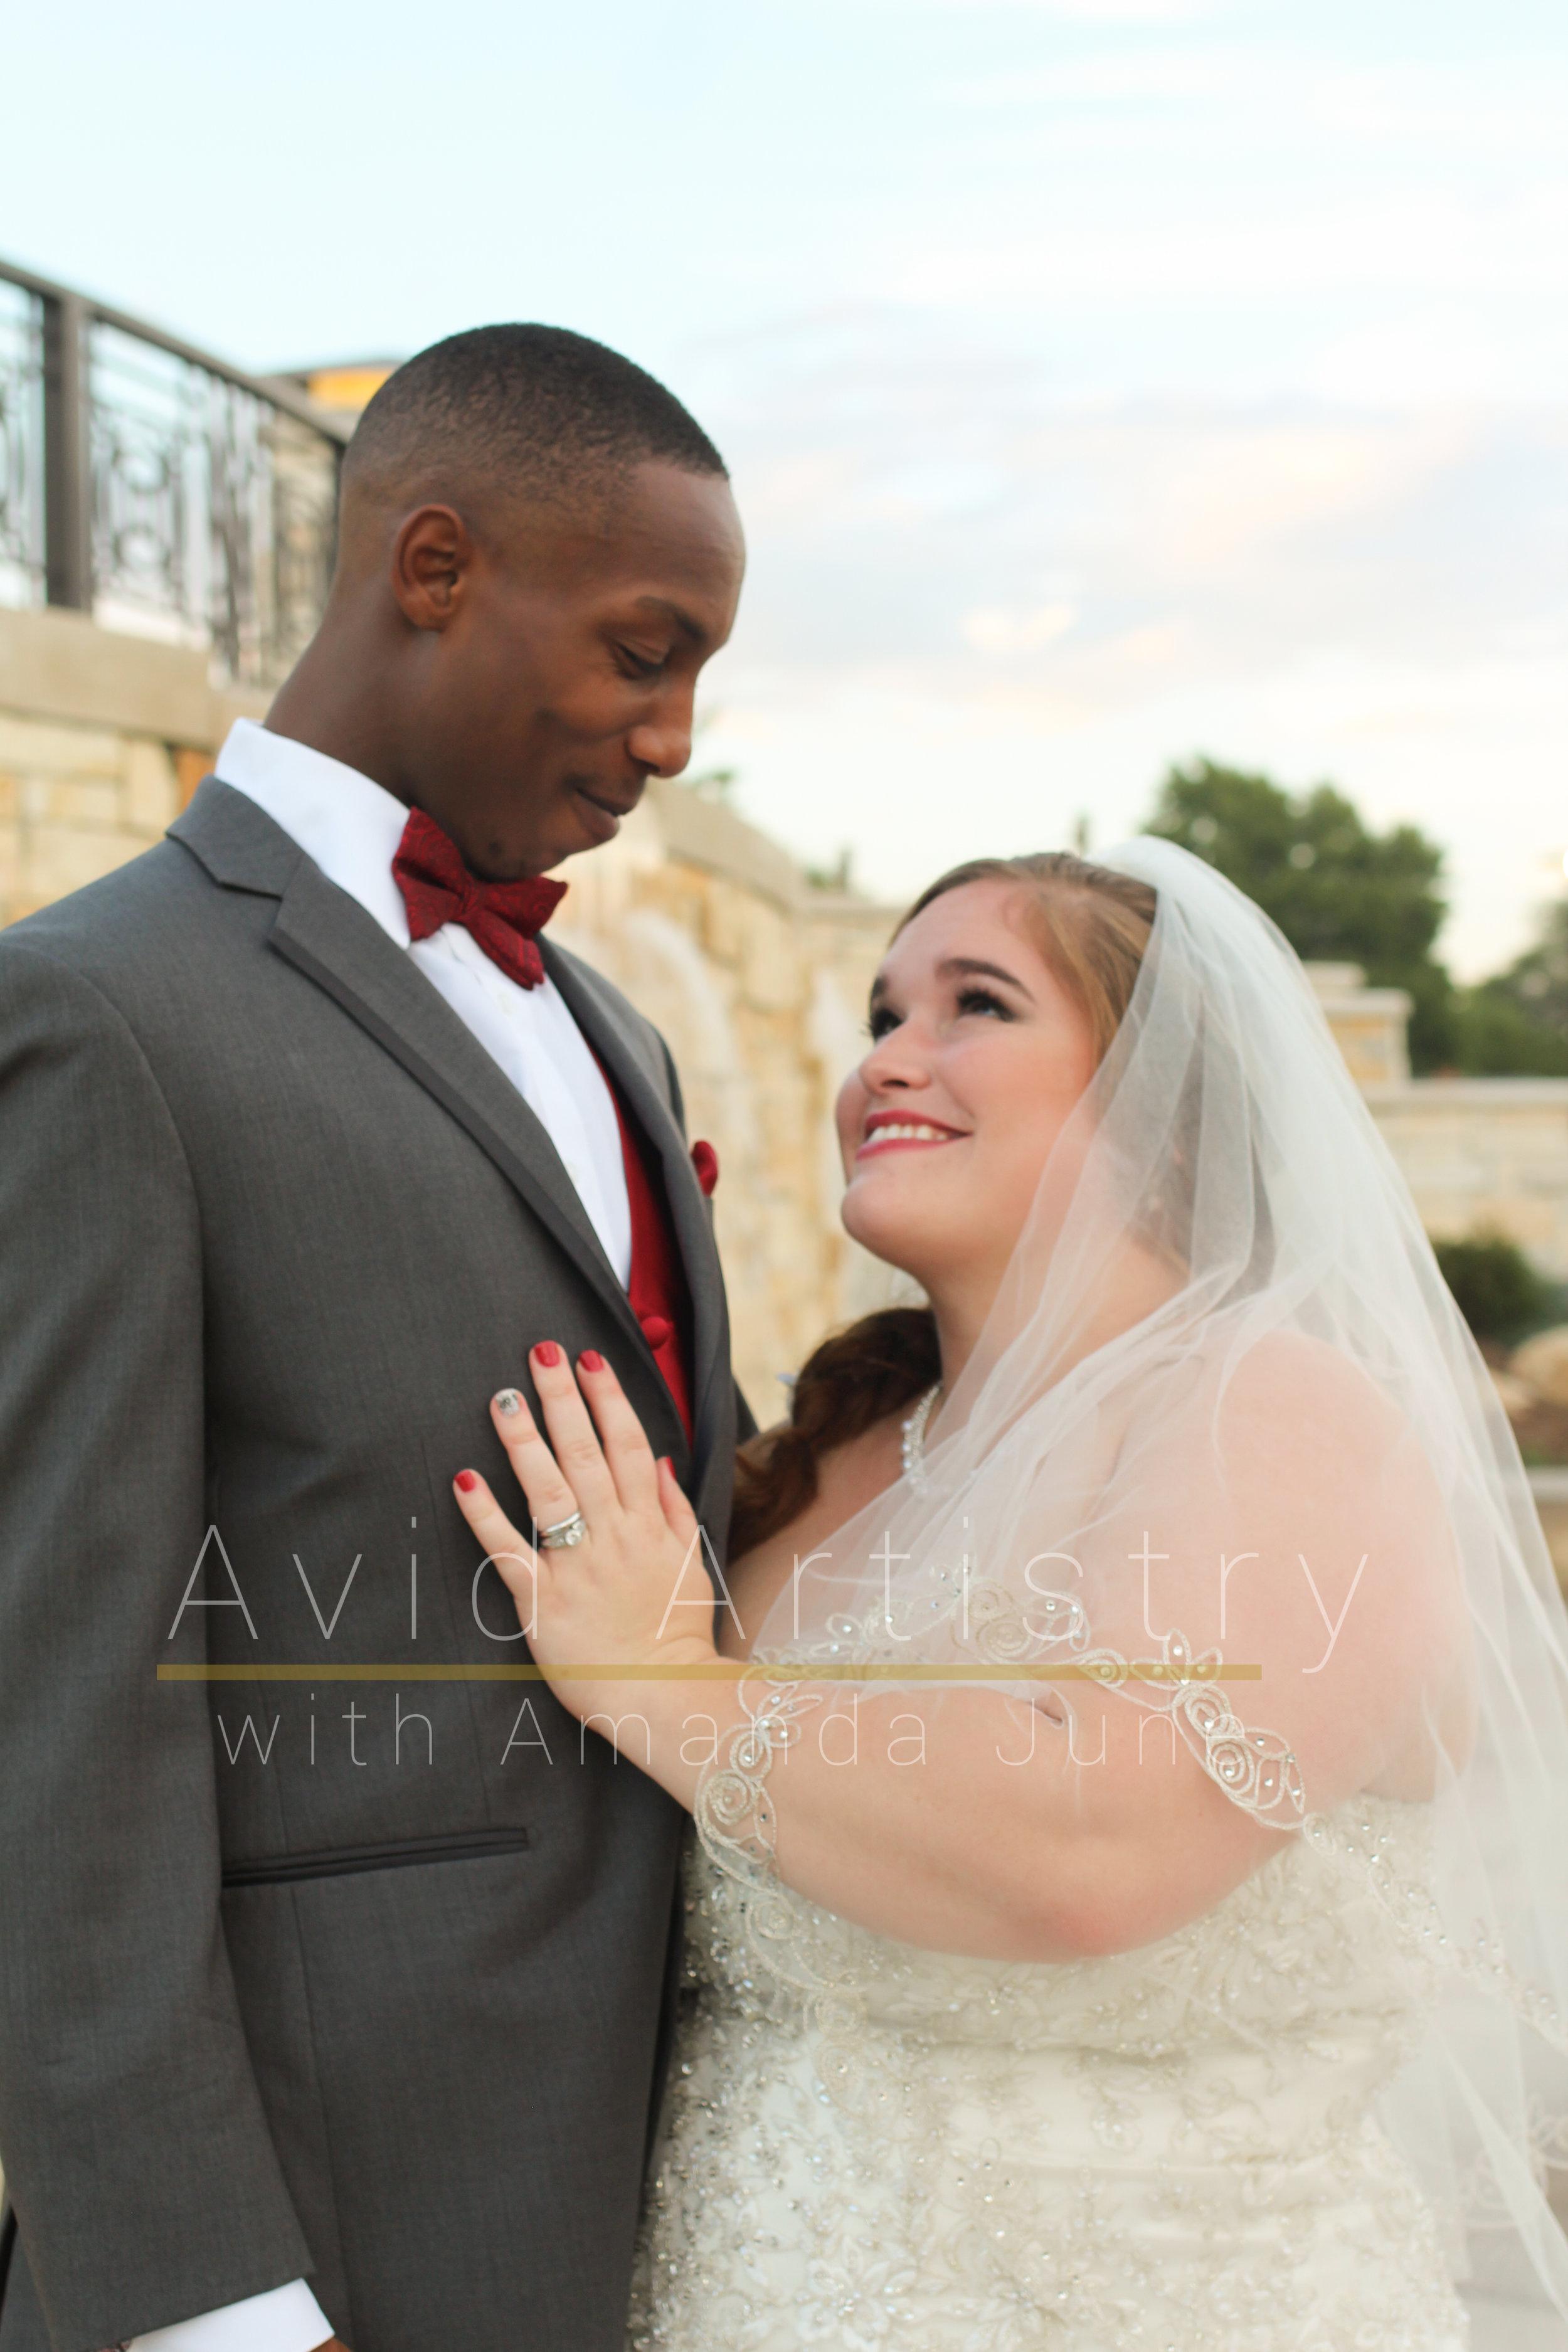 Wedding Photographer Wichita, KS. Avid Artistry